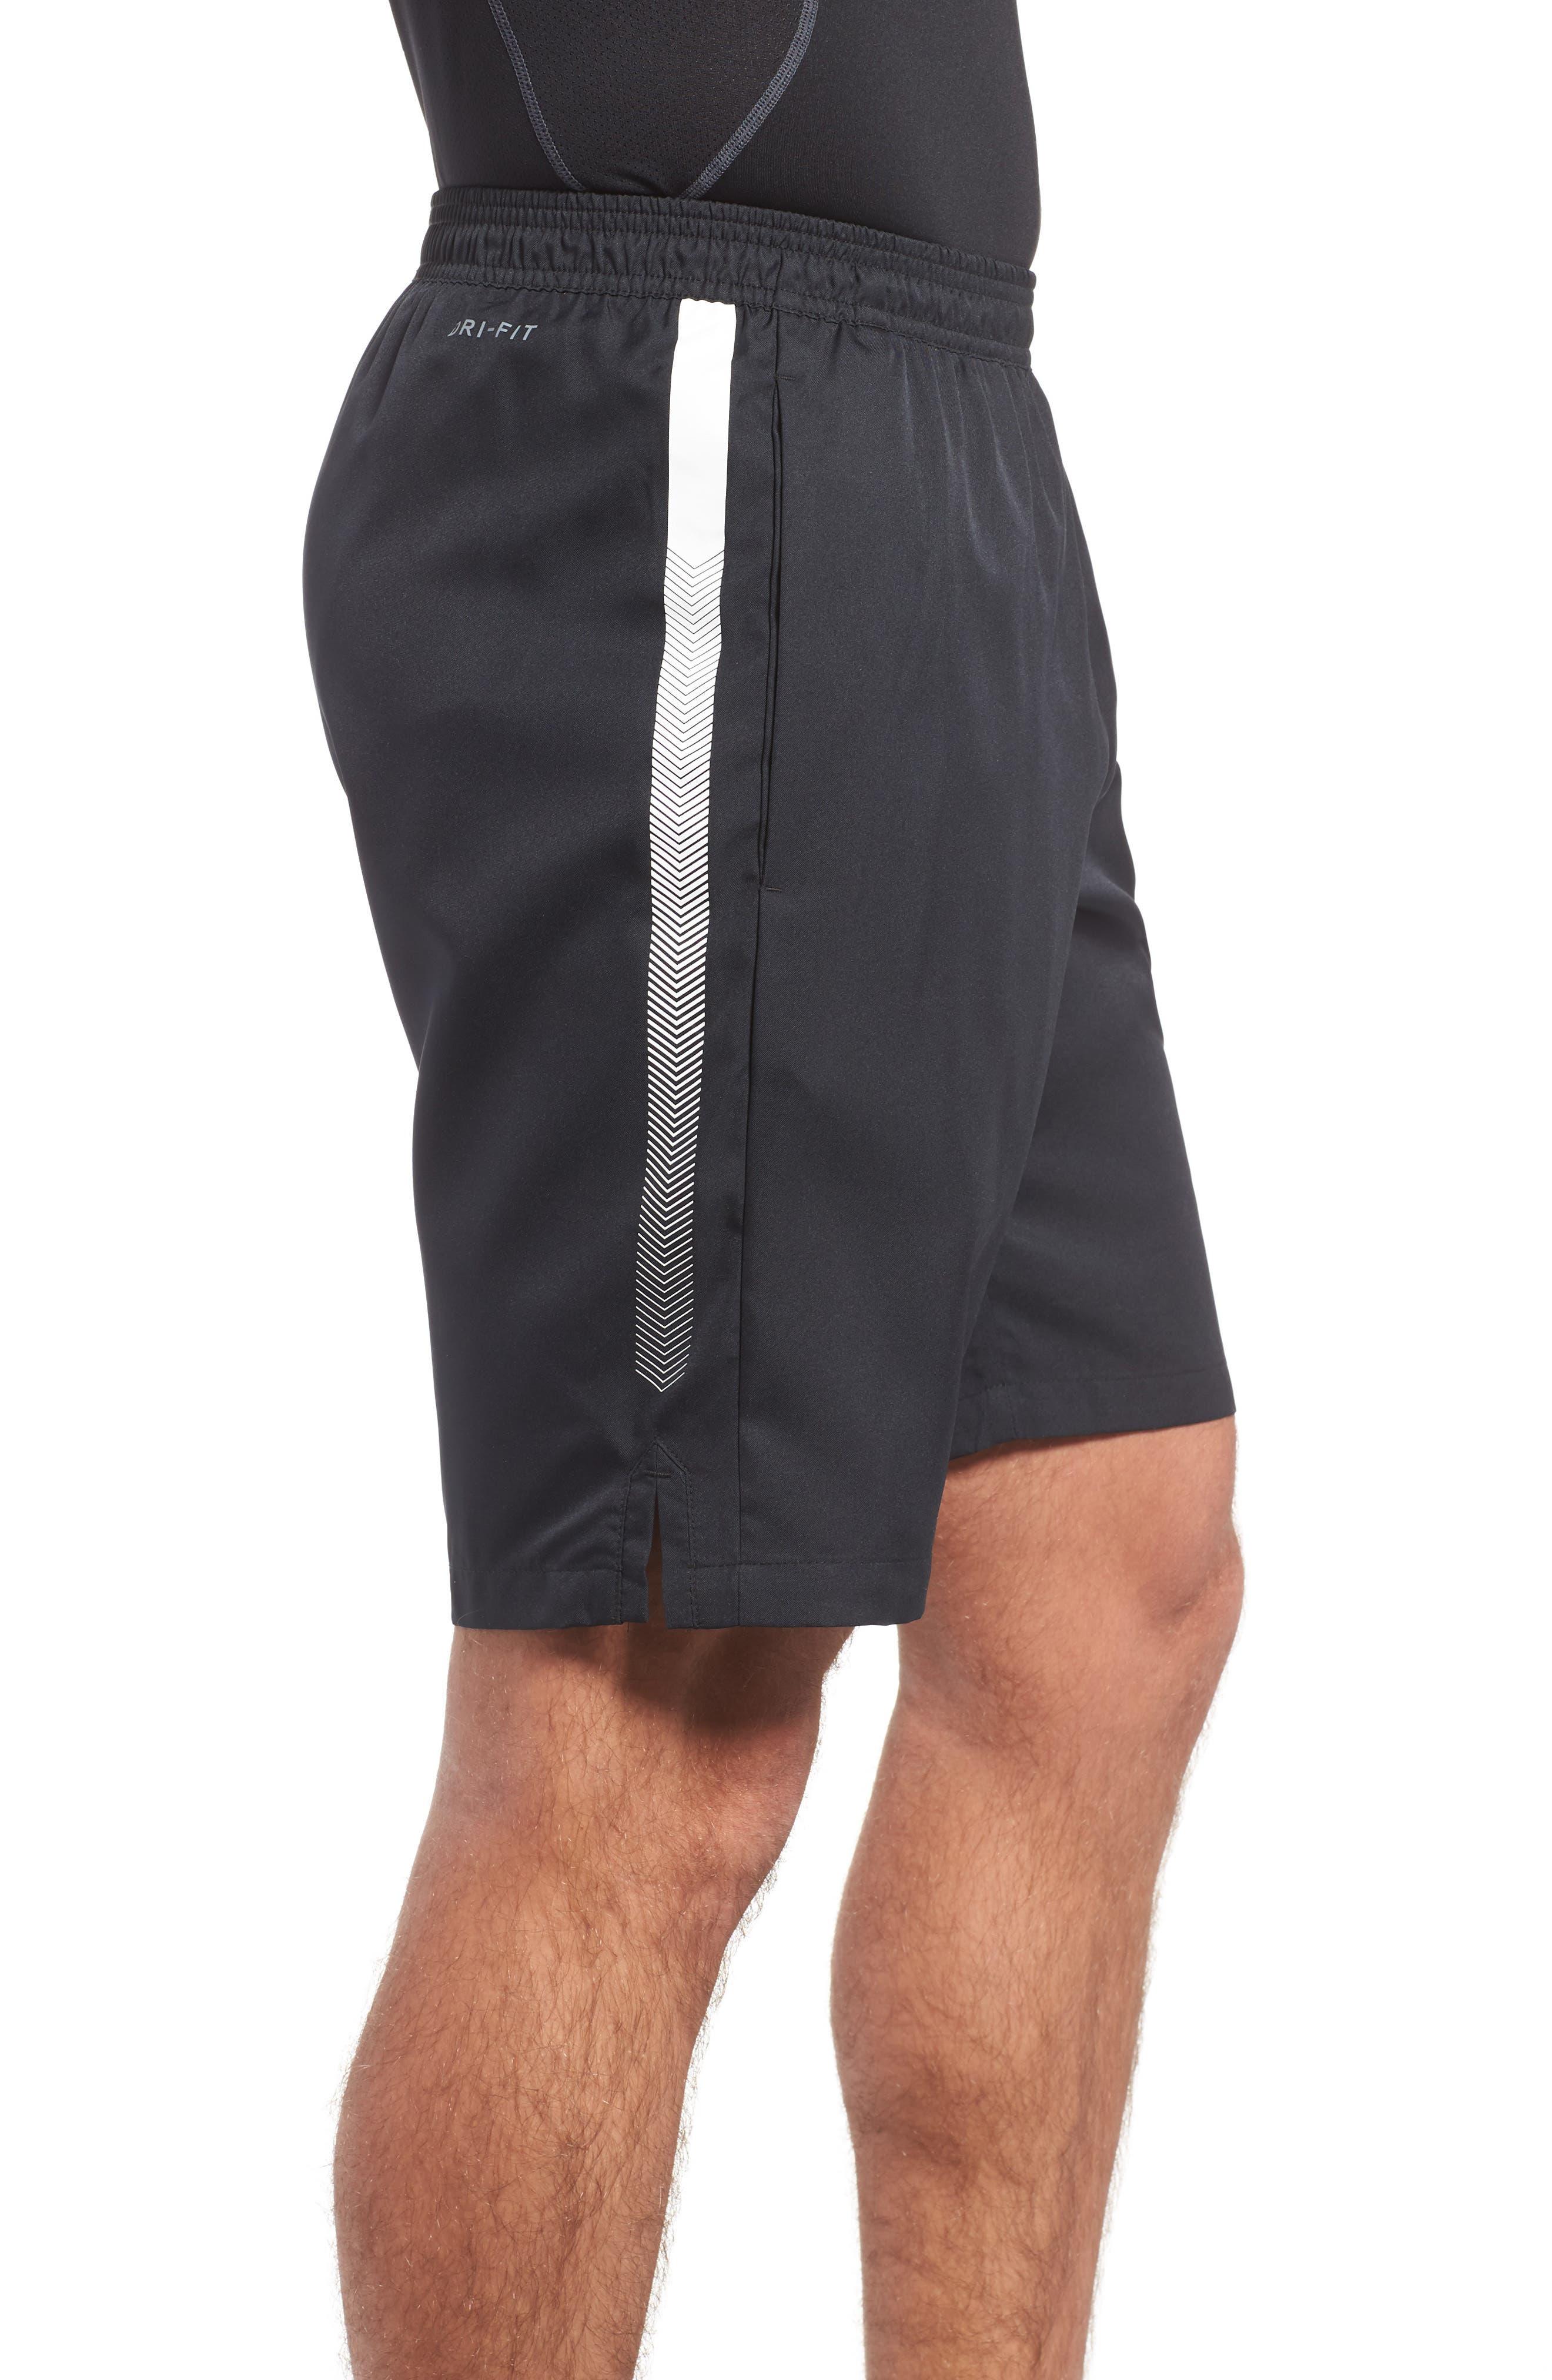 Tennis Shorts,                             Alternate thumbnail 3, color,                             010